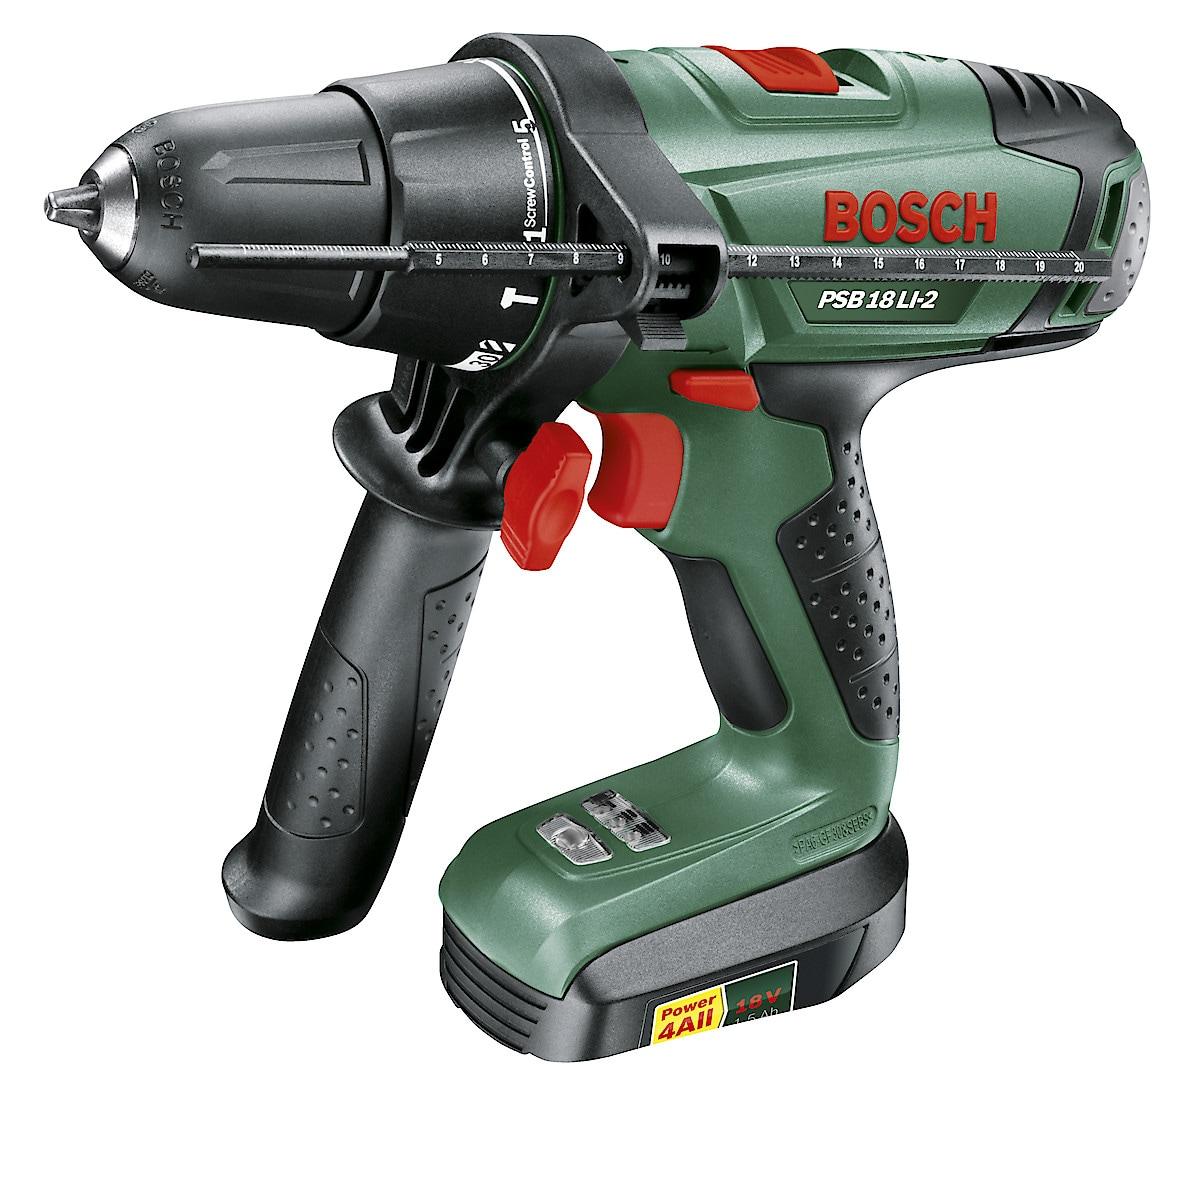 Bosch PSB 18 LI-2 Hammer Drill/Driver